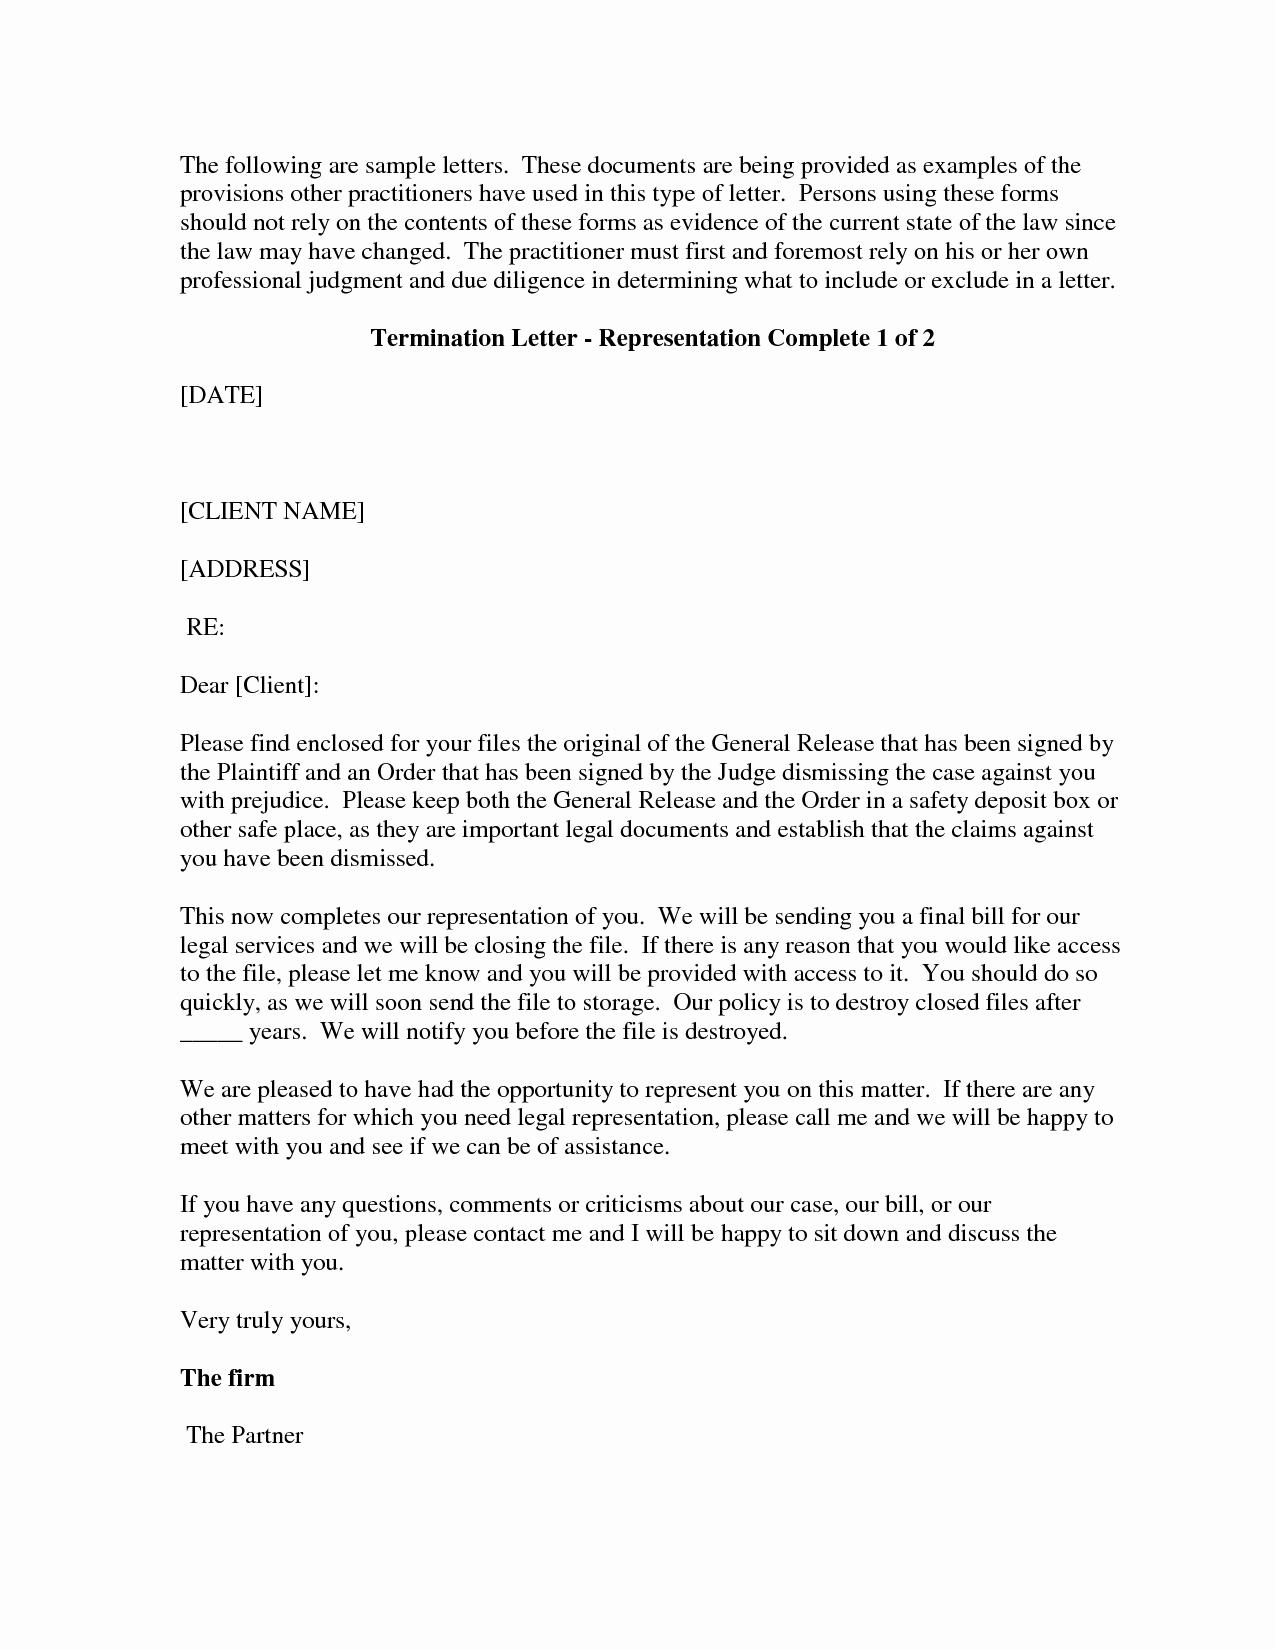 Attorney Client Letter Template Unique Letter Termination Free Printable Documents